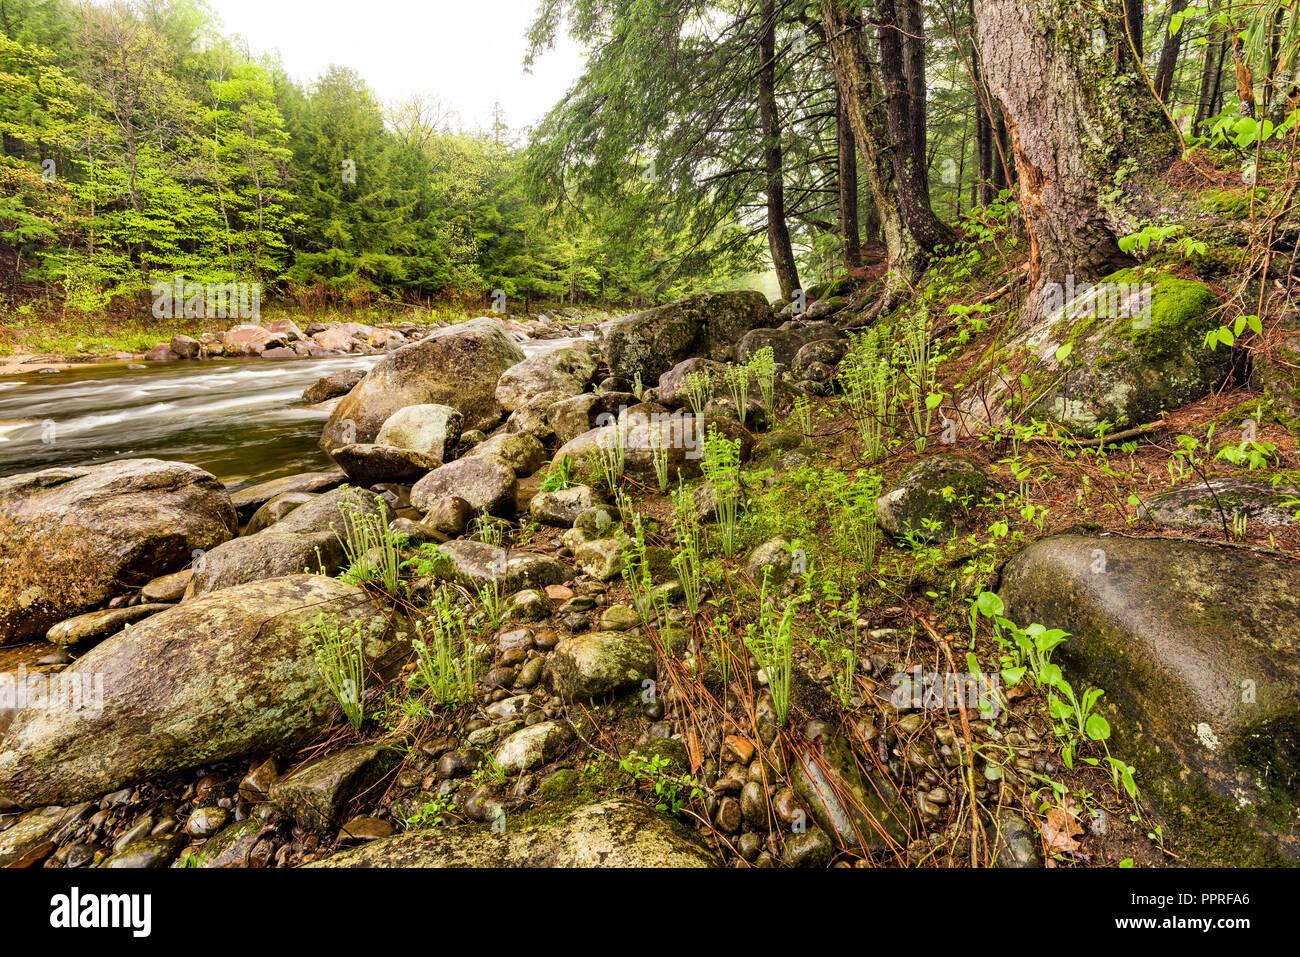 Fiddleheads and ferns along the bank of Sacandaga River, Adirondack Mountains, Hamilton Co., NY - Stock Image